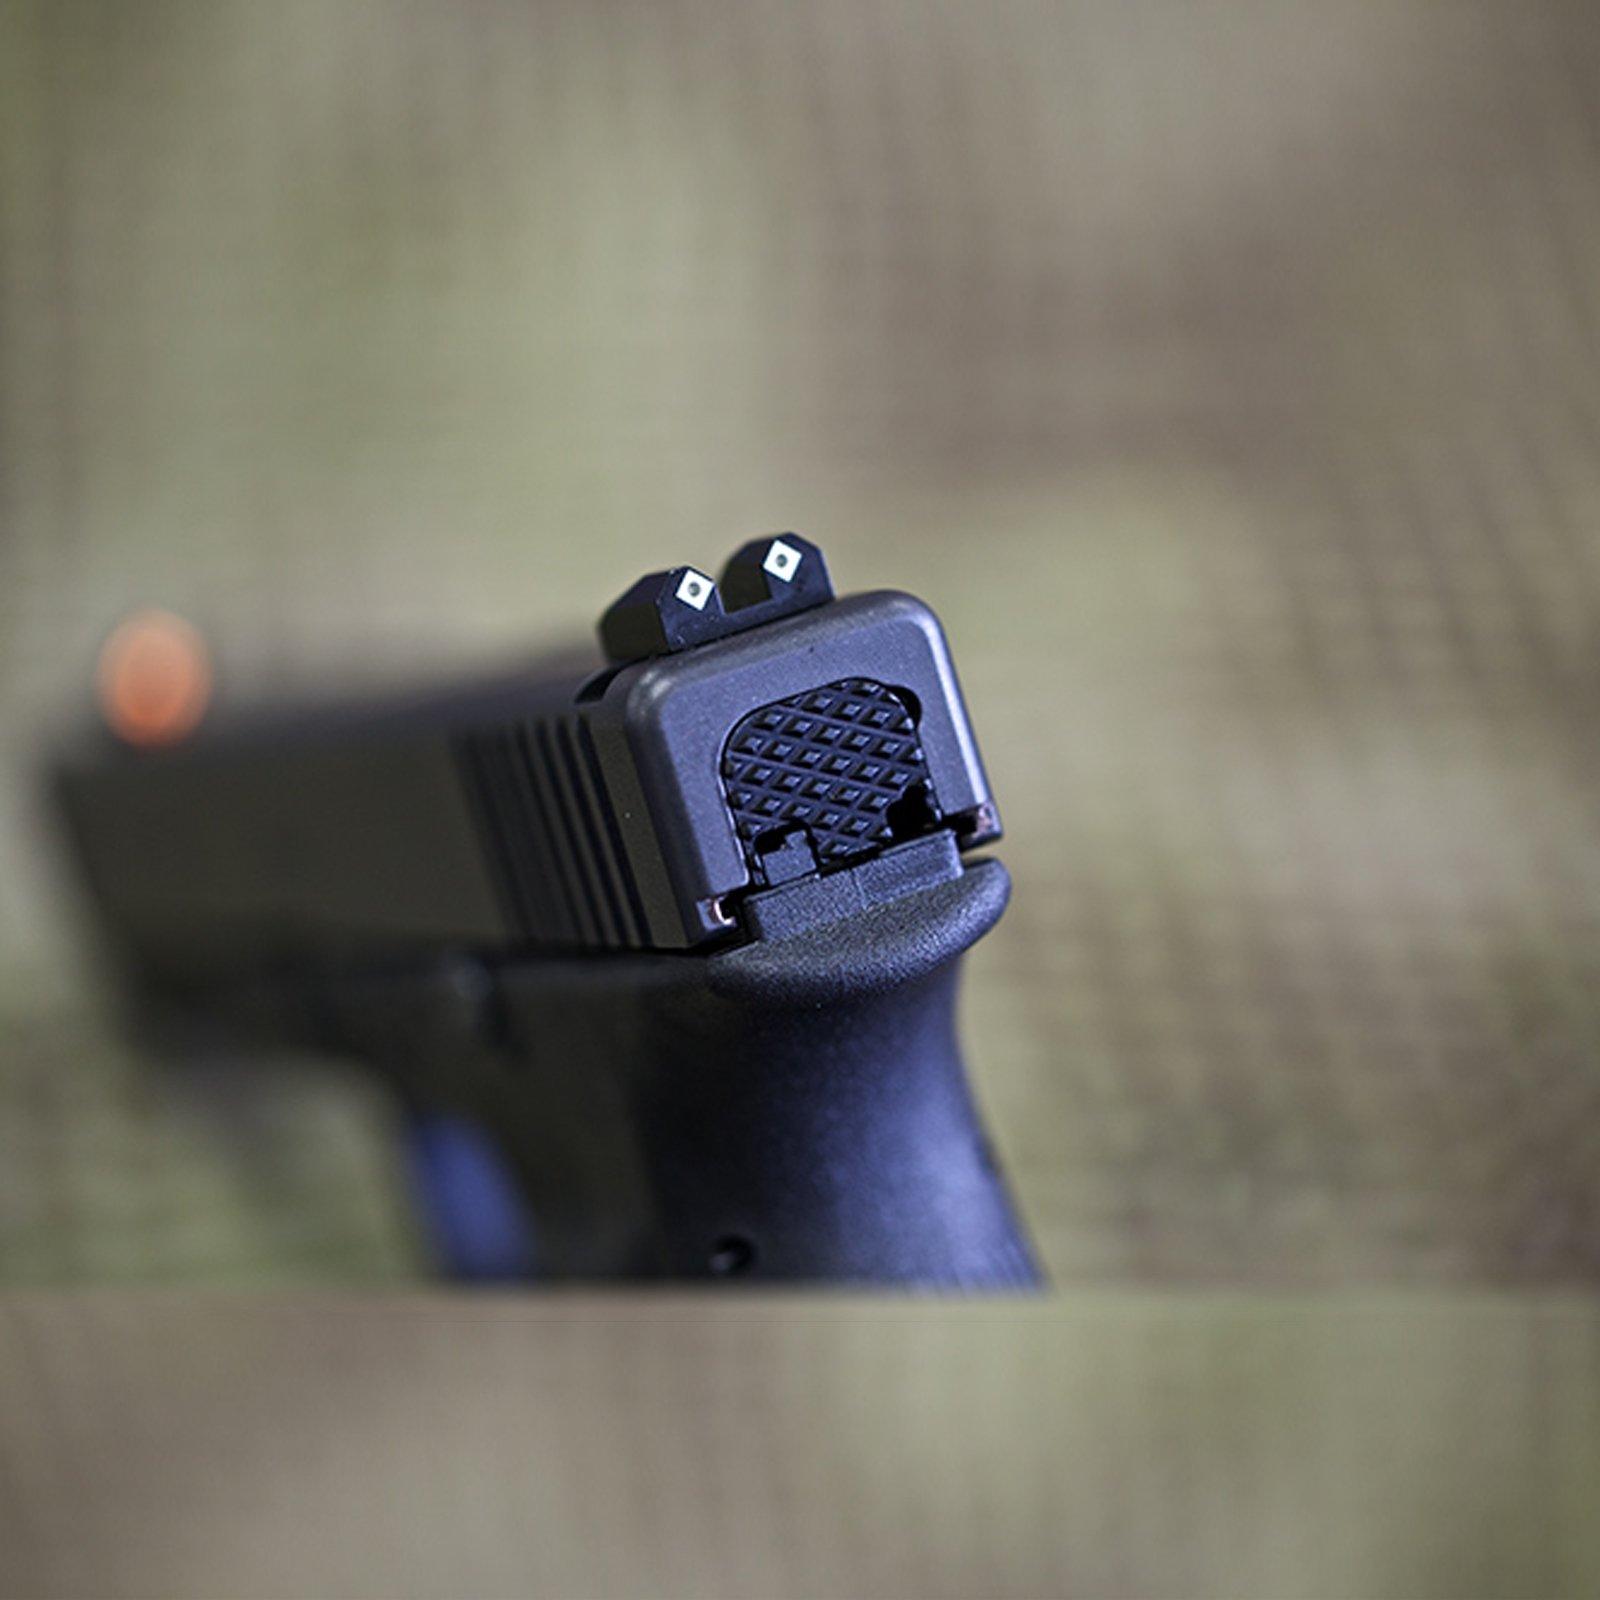 Flatline Ops Glock Slide Plate Cover Gun Accessory - 30 Degree Pattern